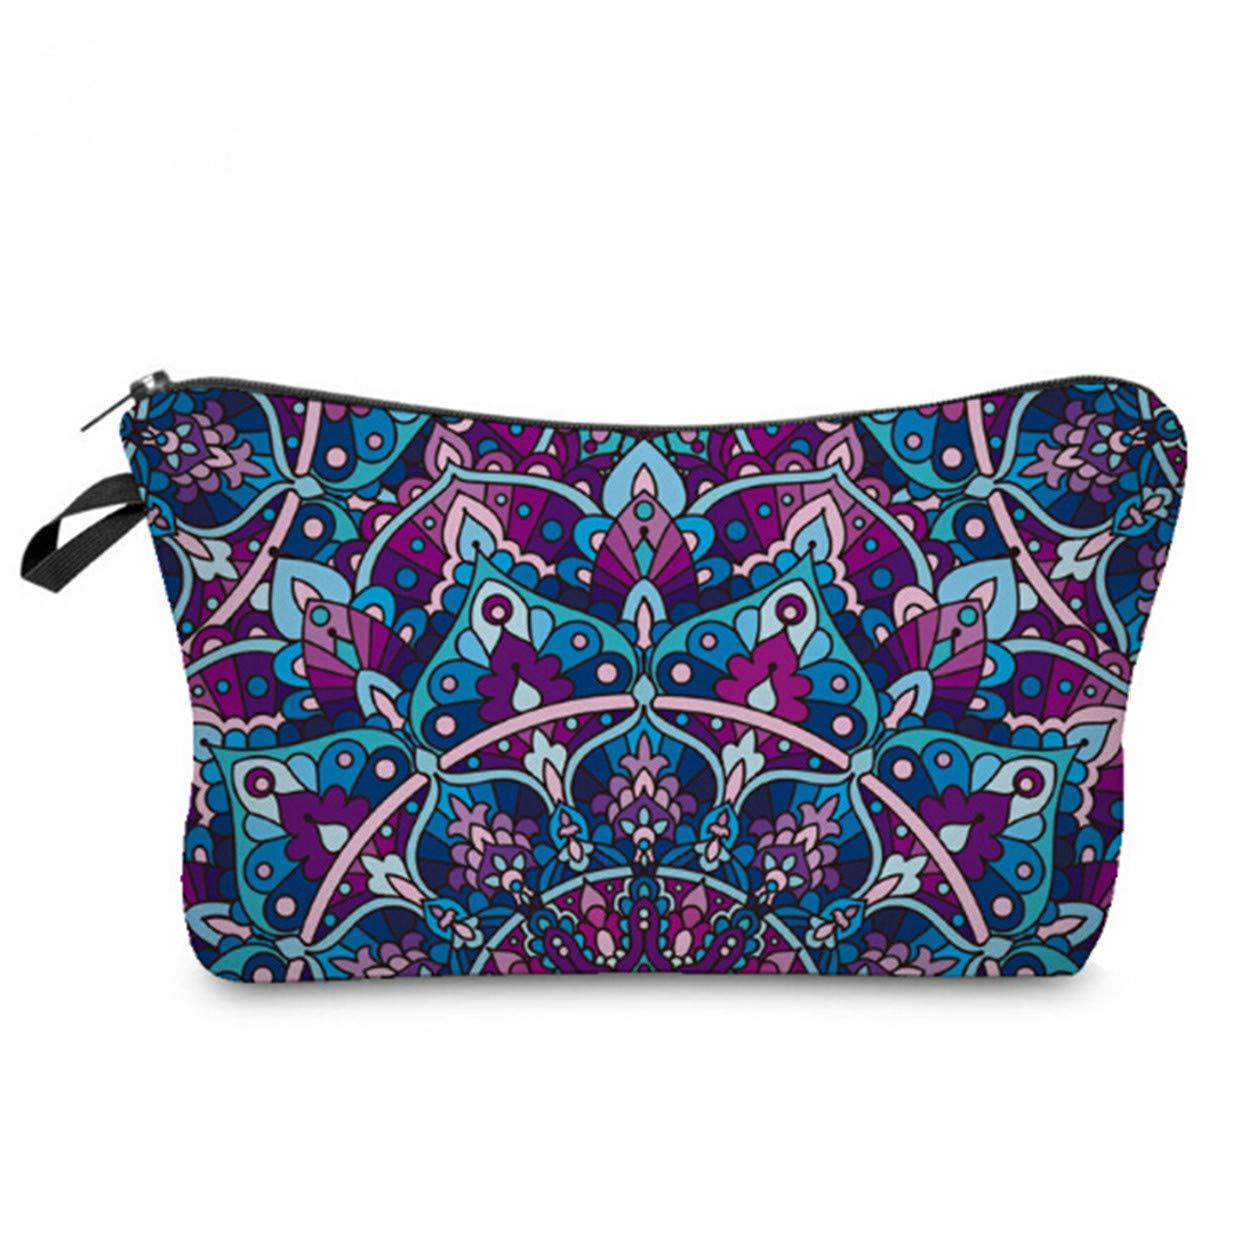 LALANG Mandala Flower Prints Mini Cosmetic Bag Women Zipper Coin Purse Female Makeup Bags